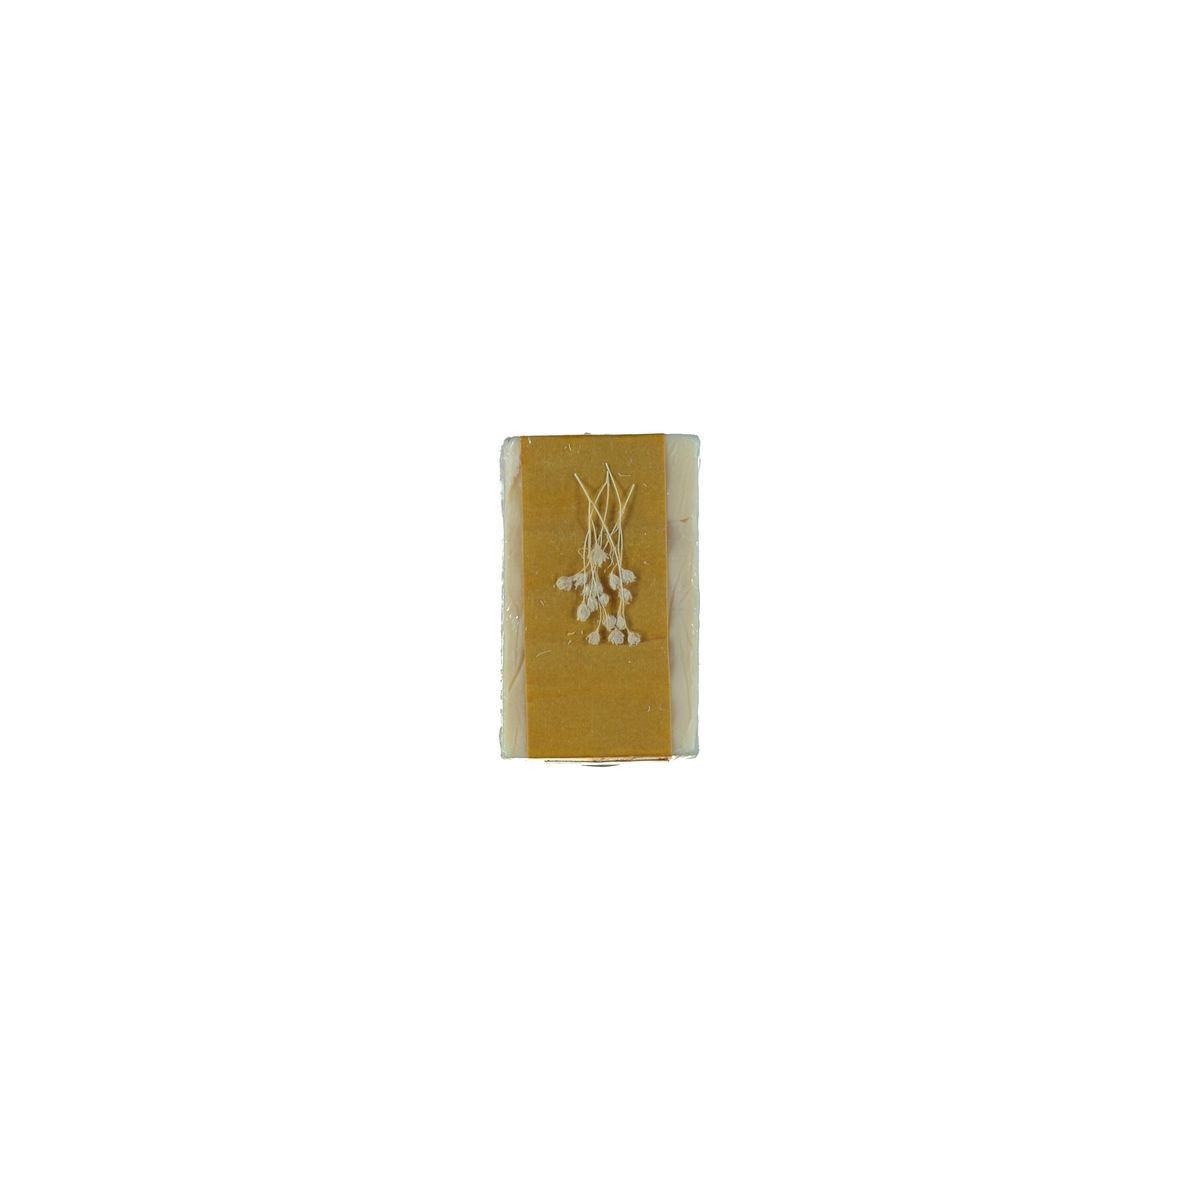 Soap Natural / Apricot - 100 gram